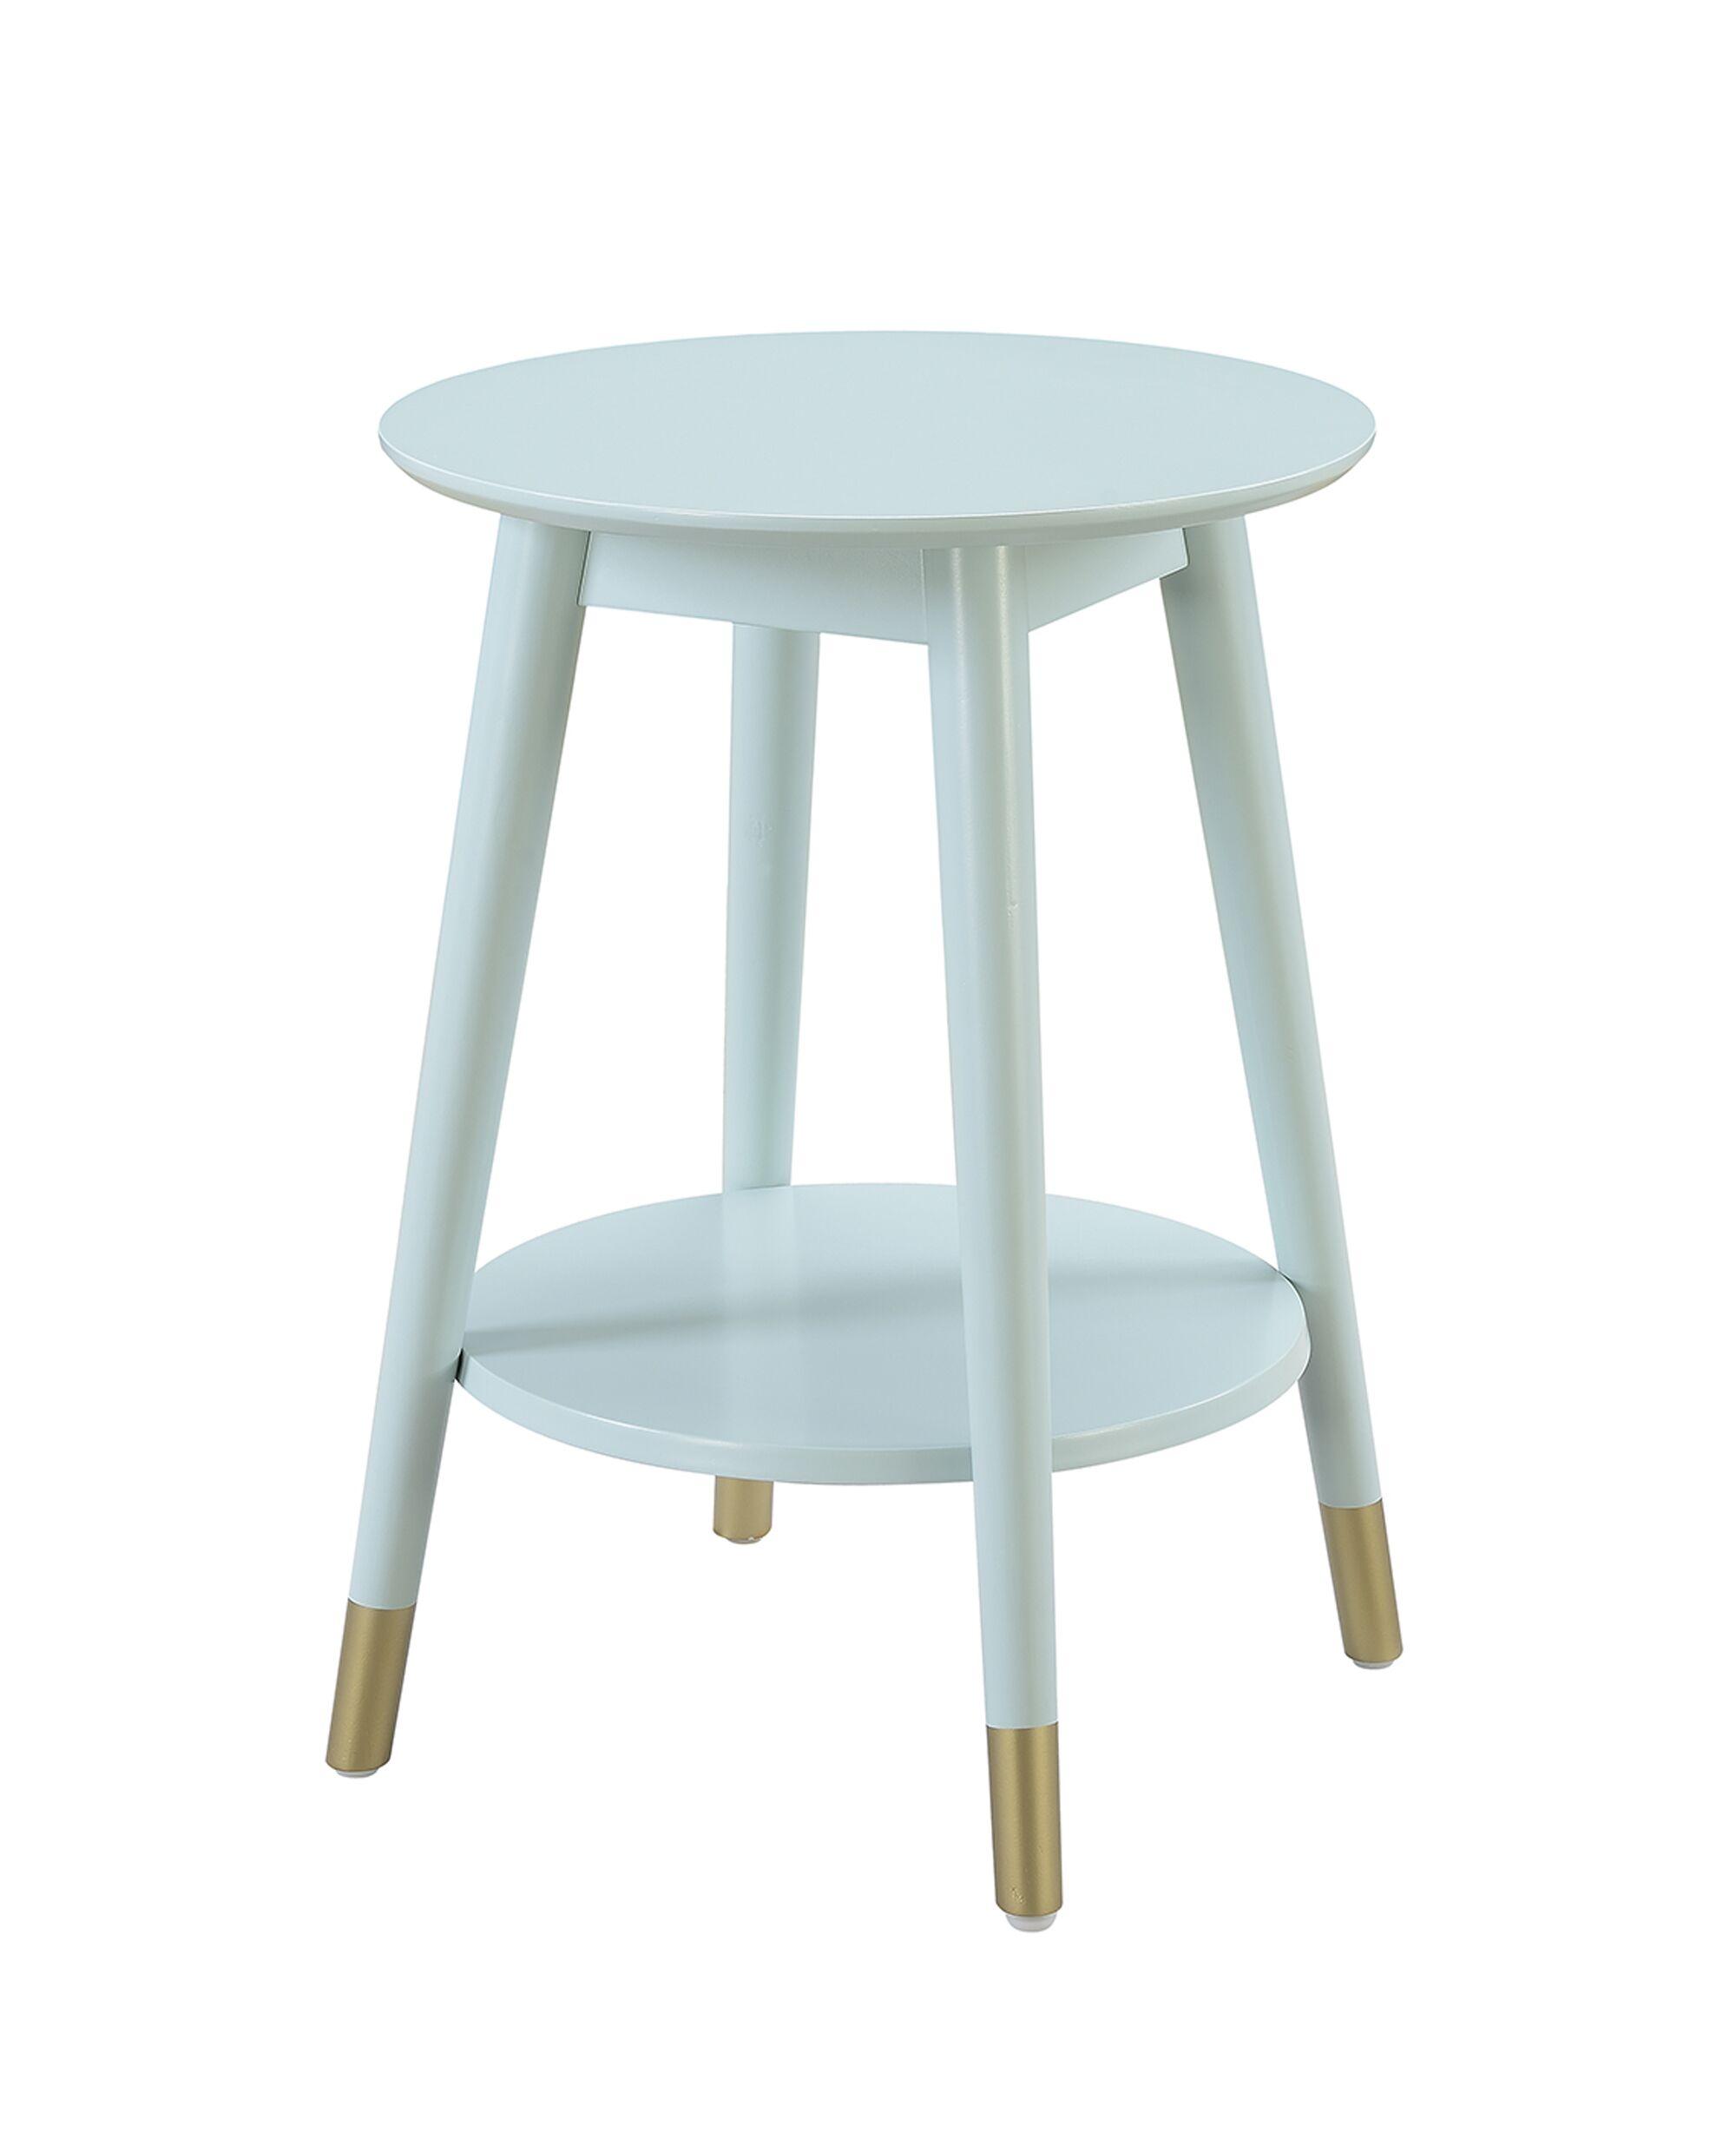 Boese End Table Color: Sea Foam